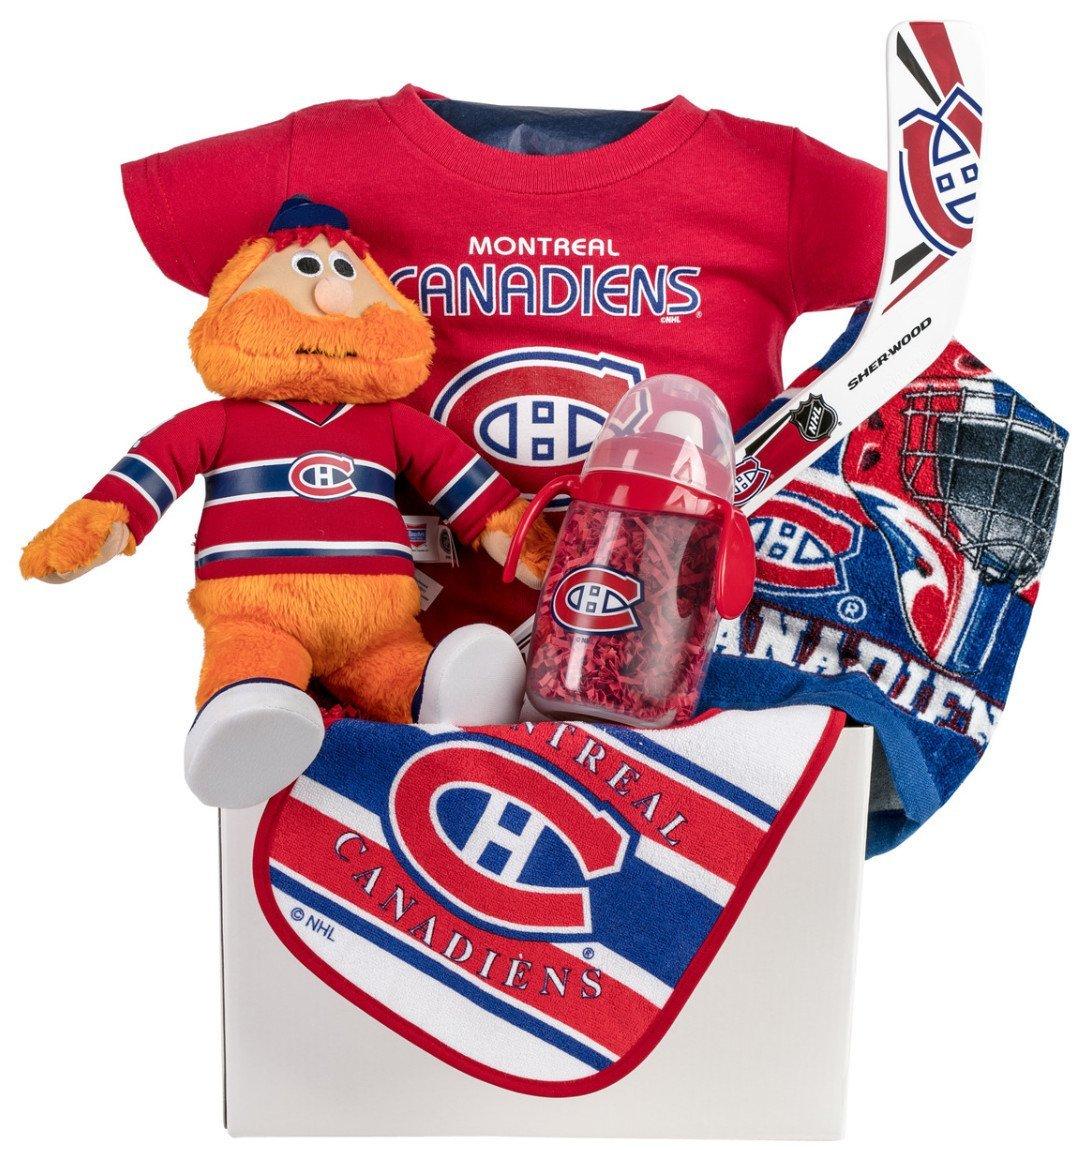 Montreal Canadian's Hab's Baby Gift Basket with Baby Essentials Pellatt Cornucopia